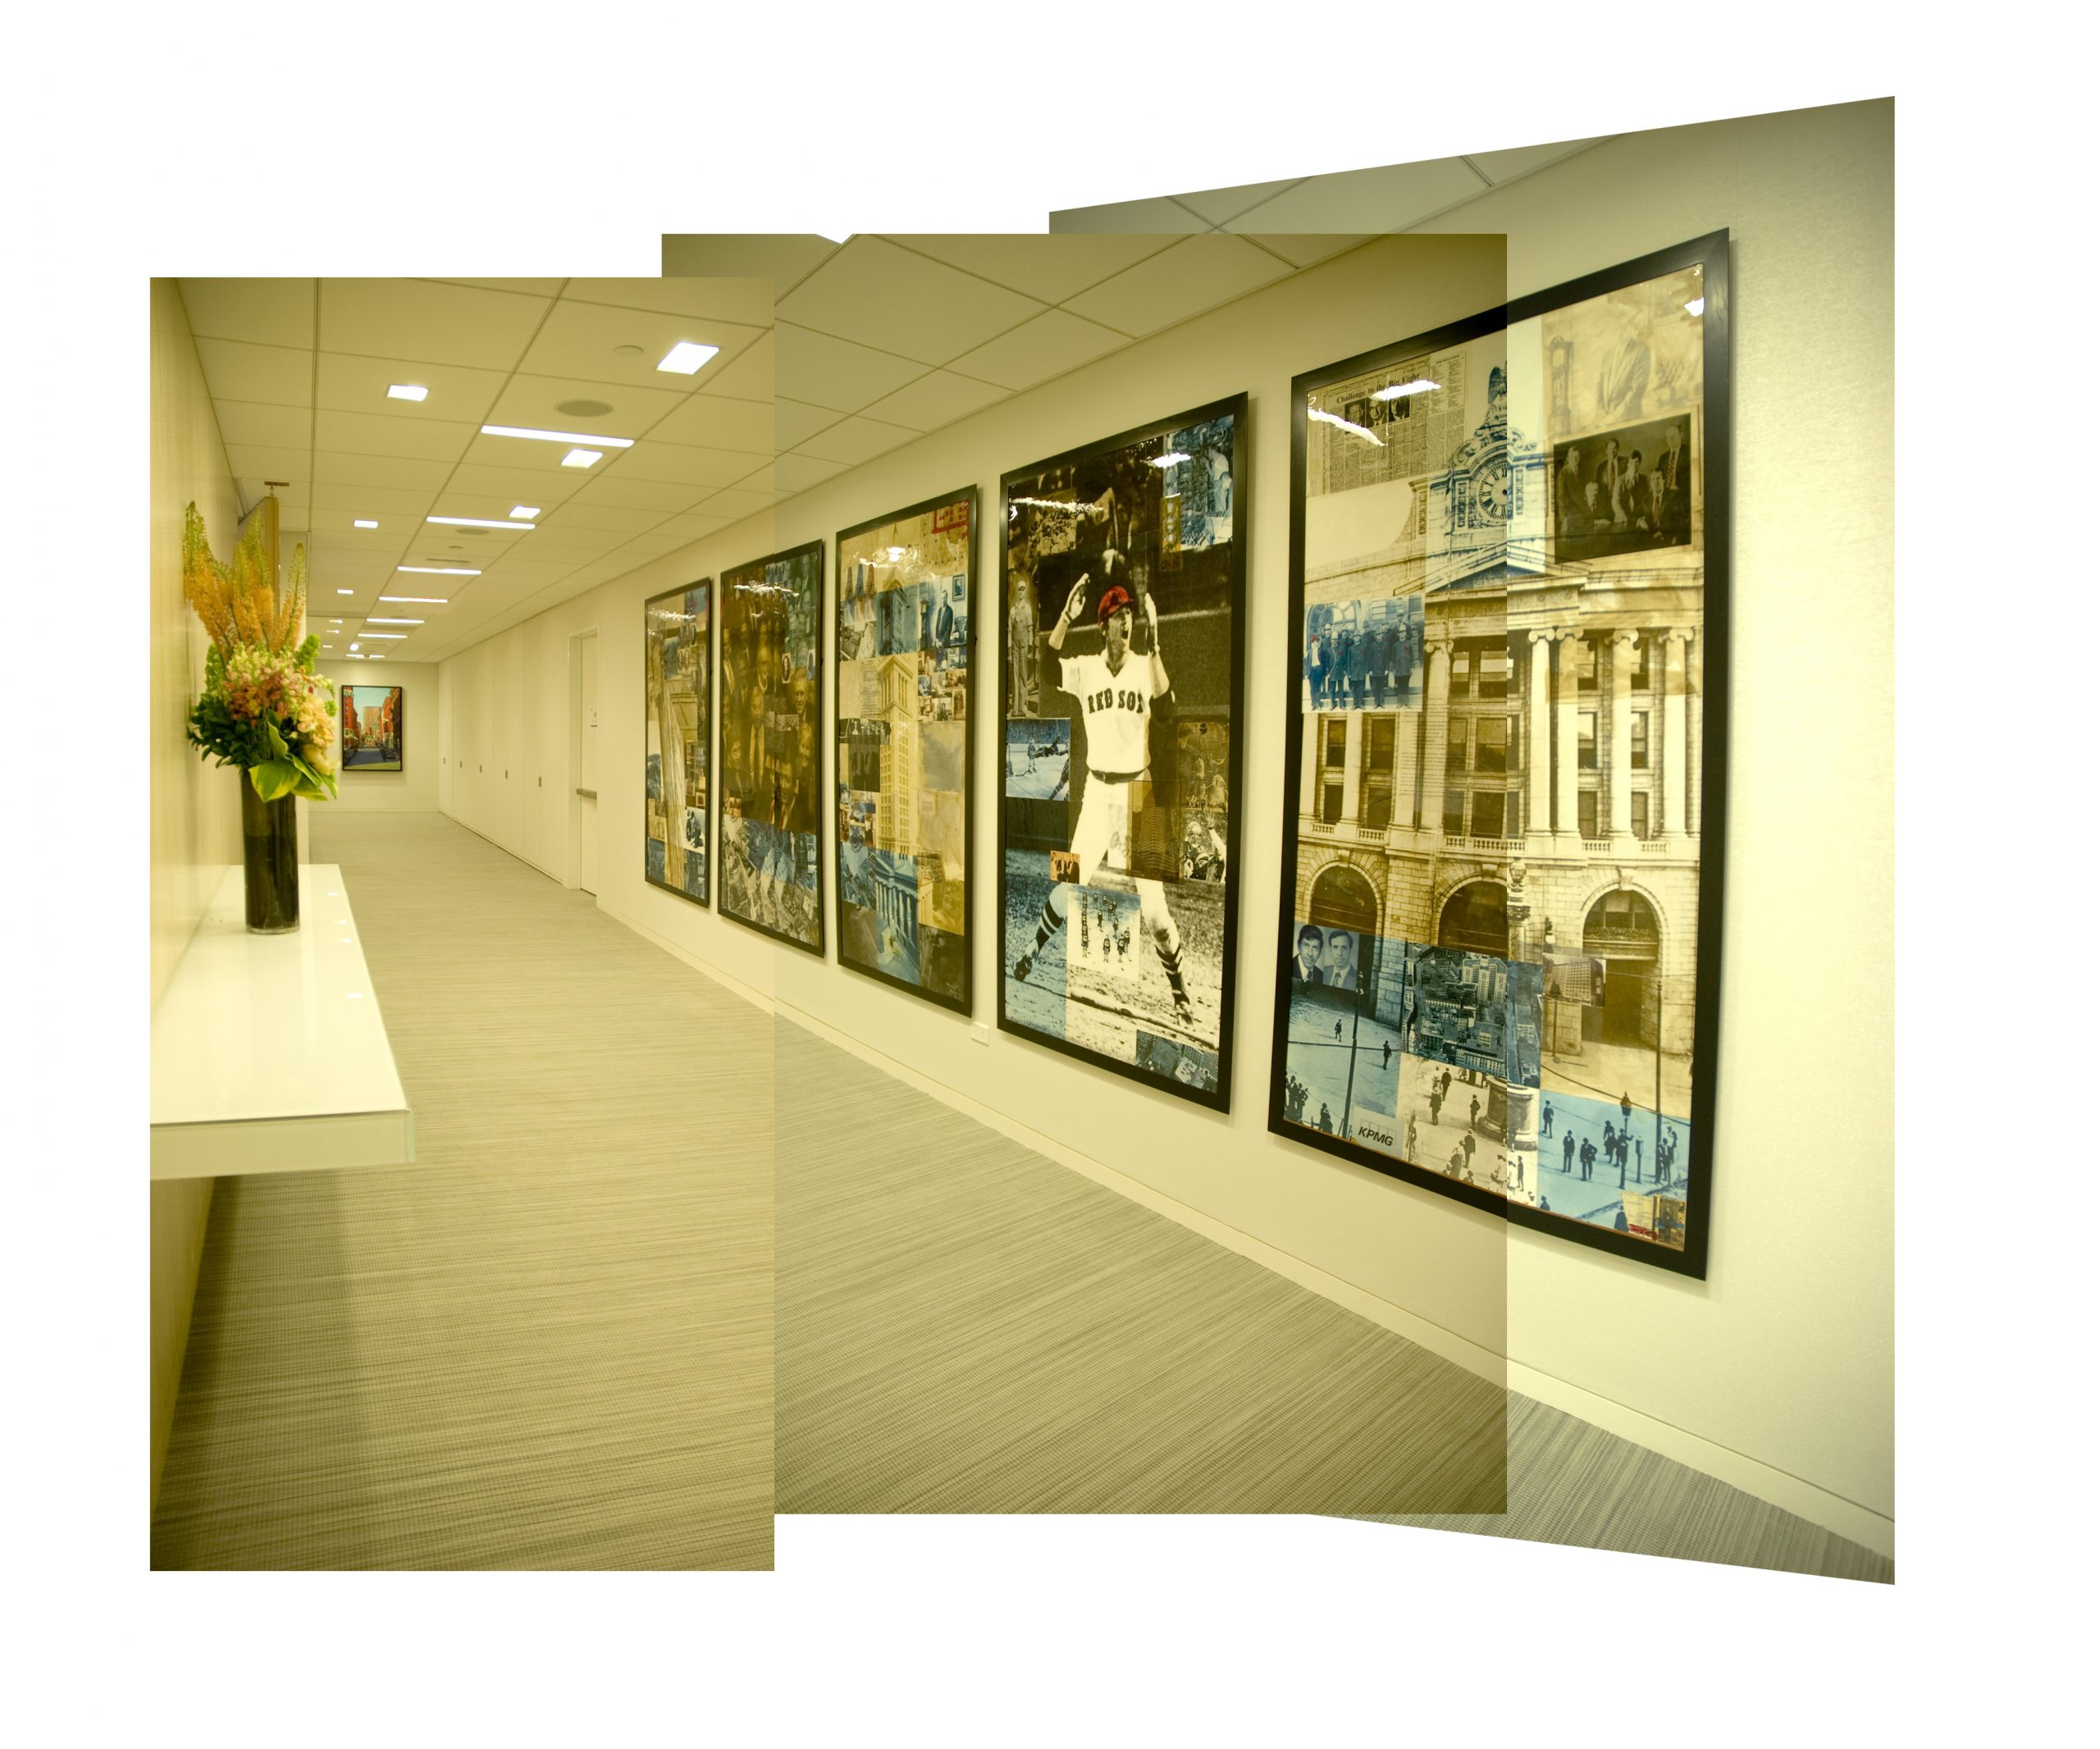 KPMG Centennial Commission